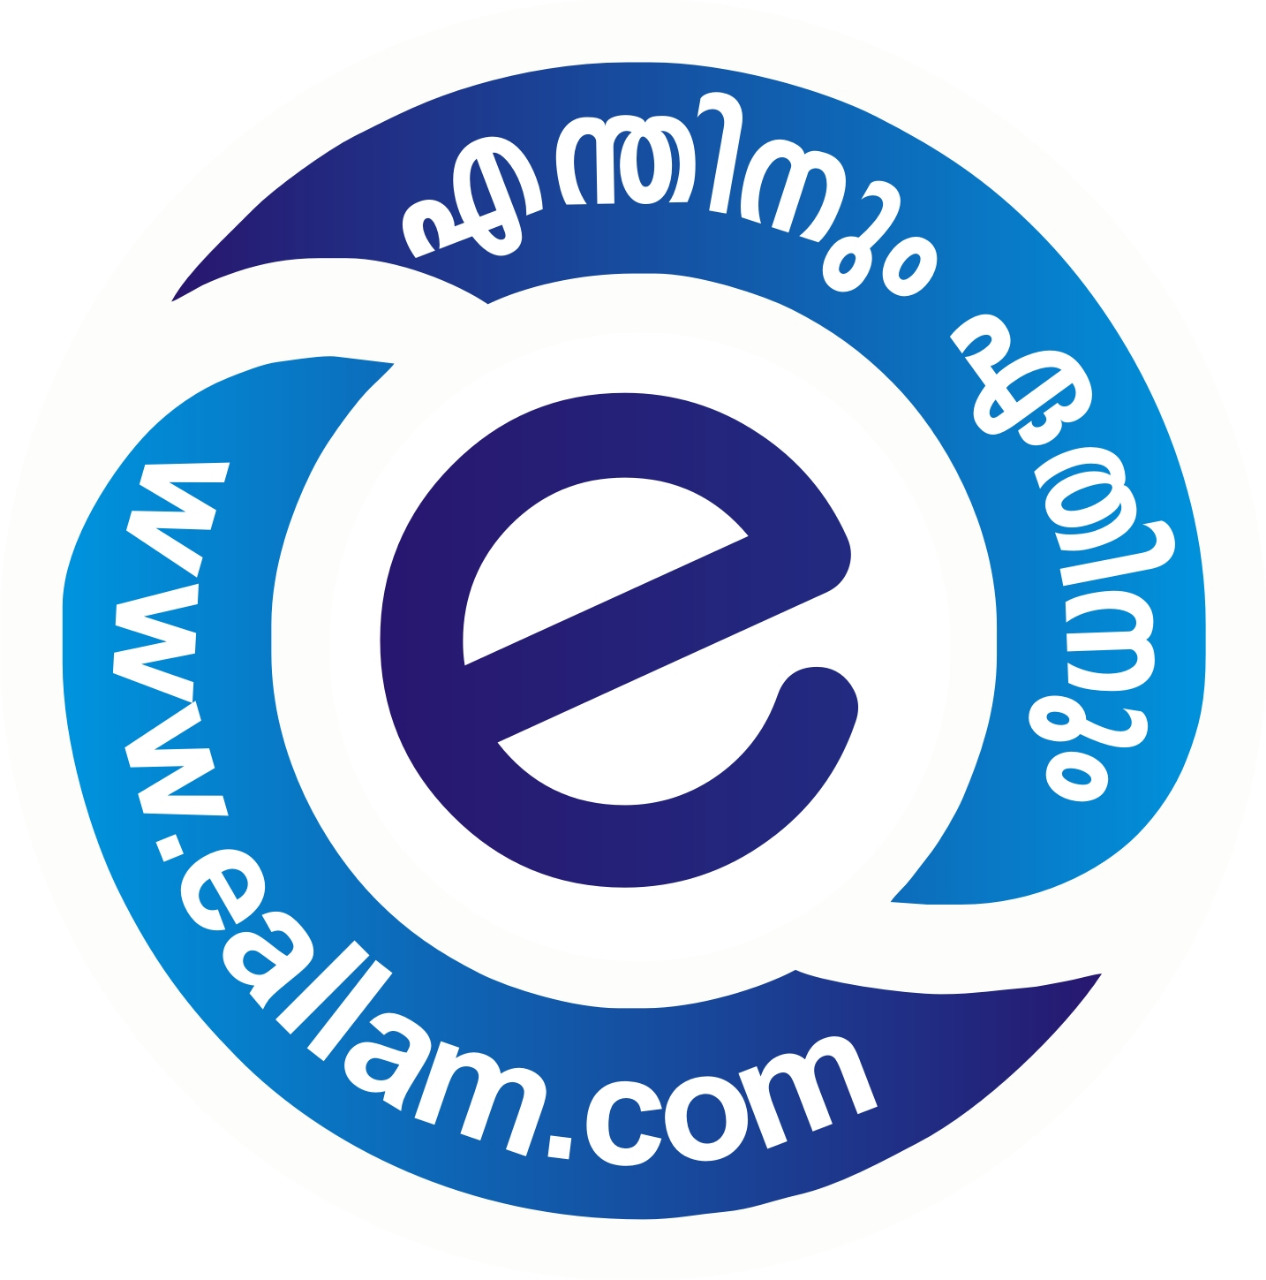 eallam